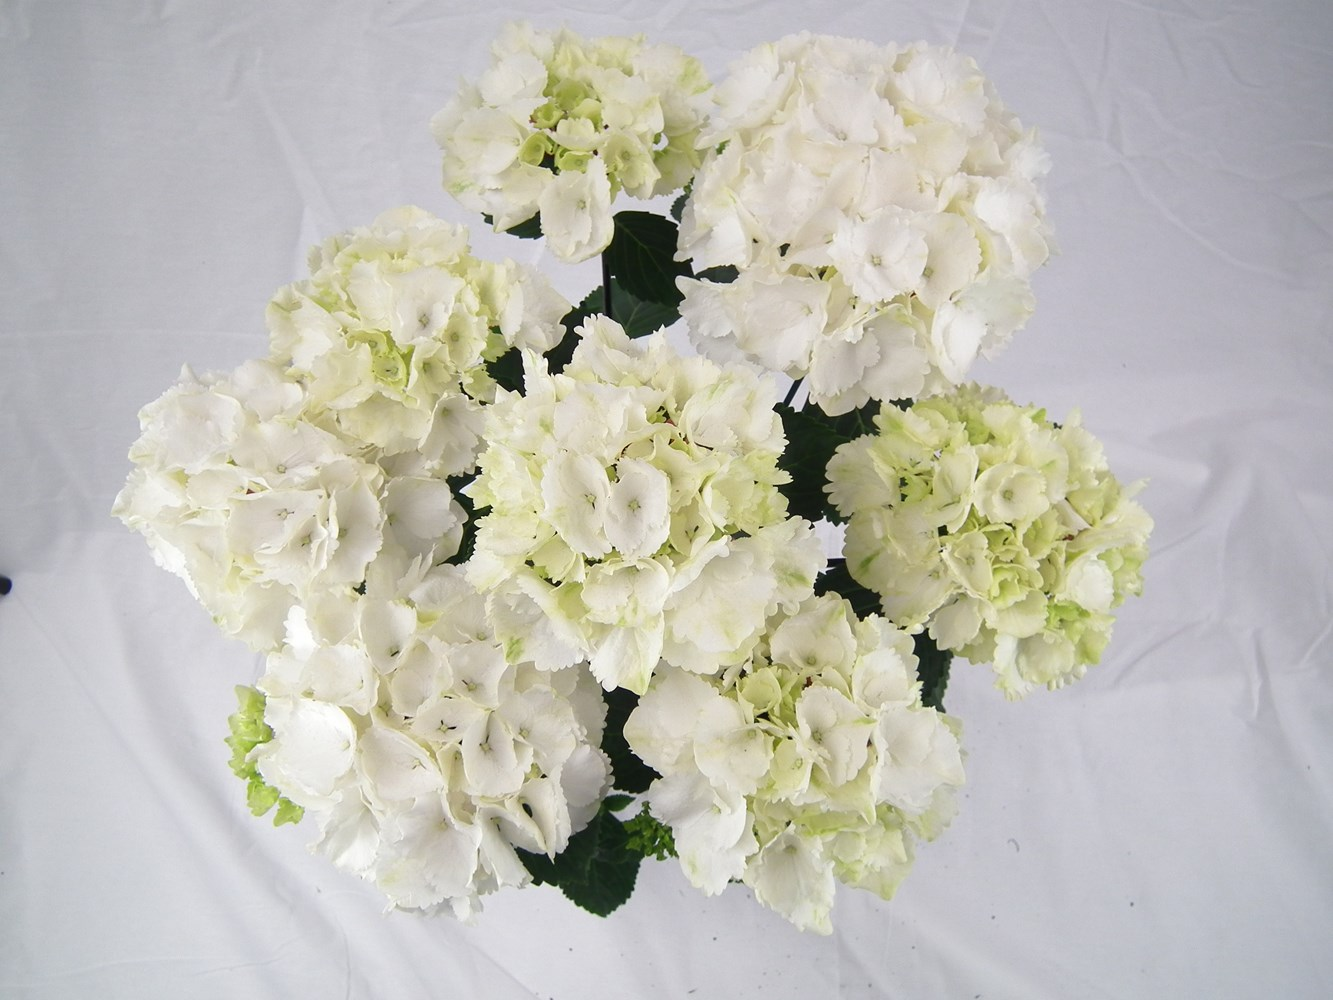 Website/Plants/2144398572/Images/Gallery/h_whiteknight_02.0.jpg